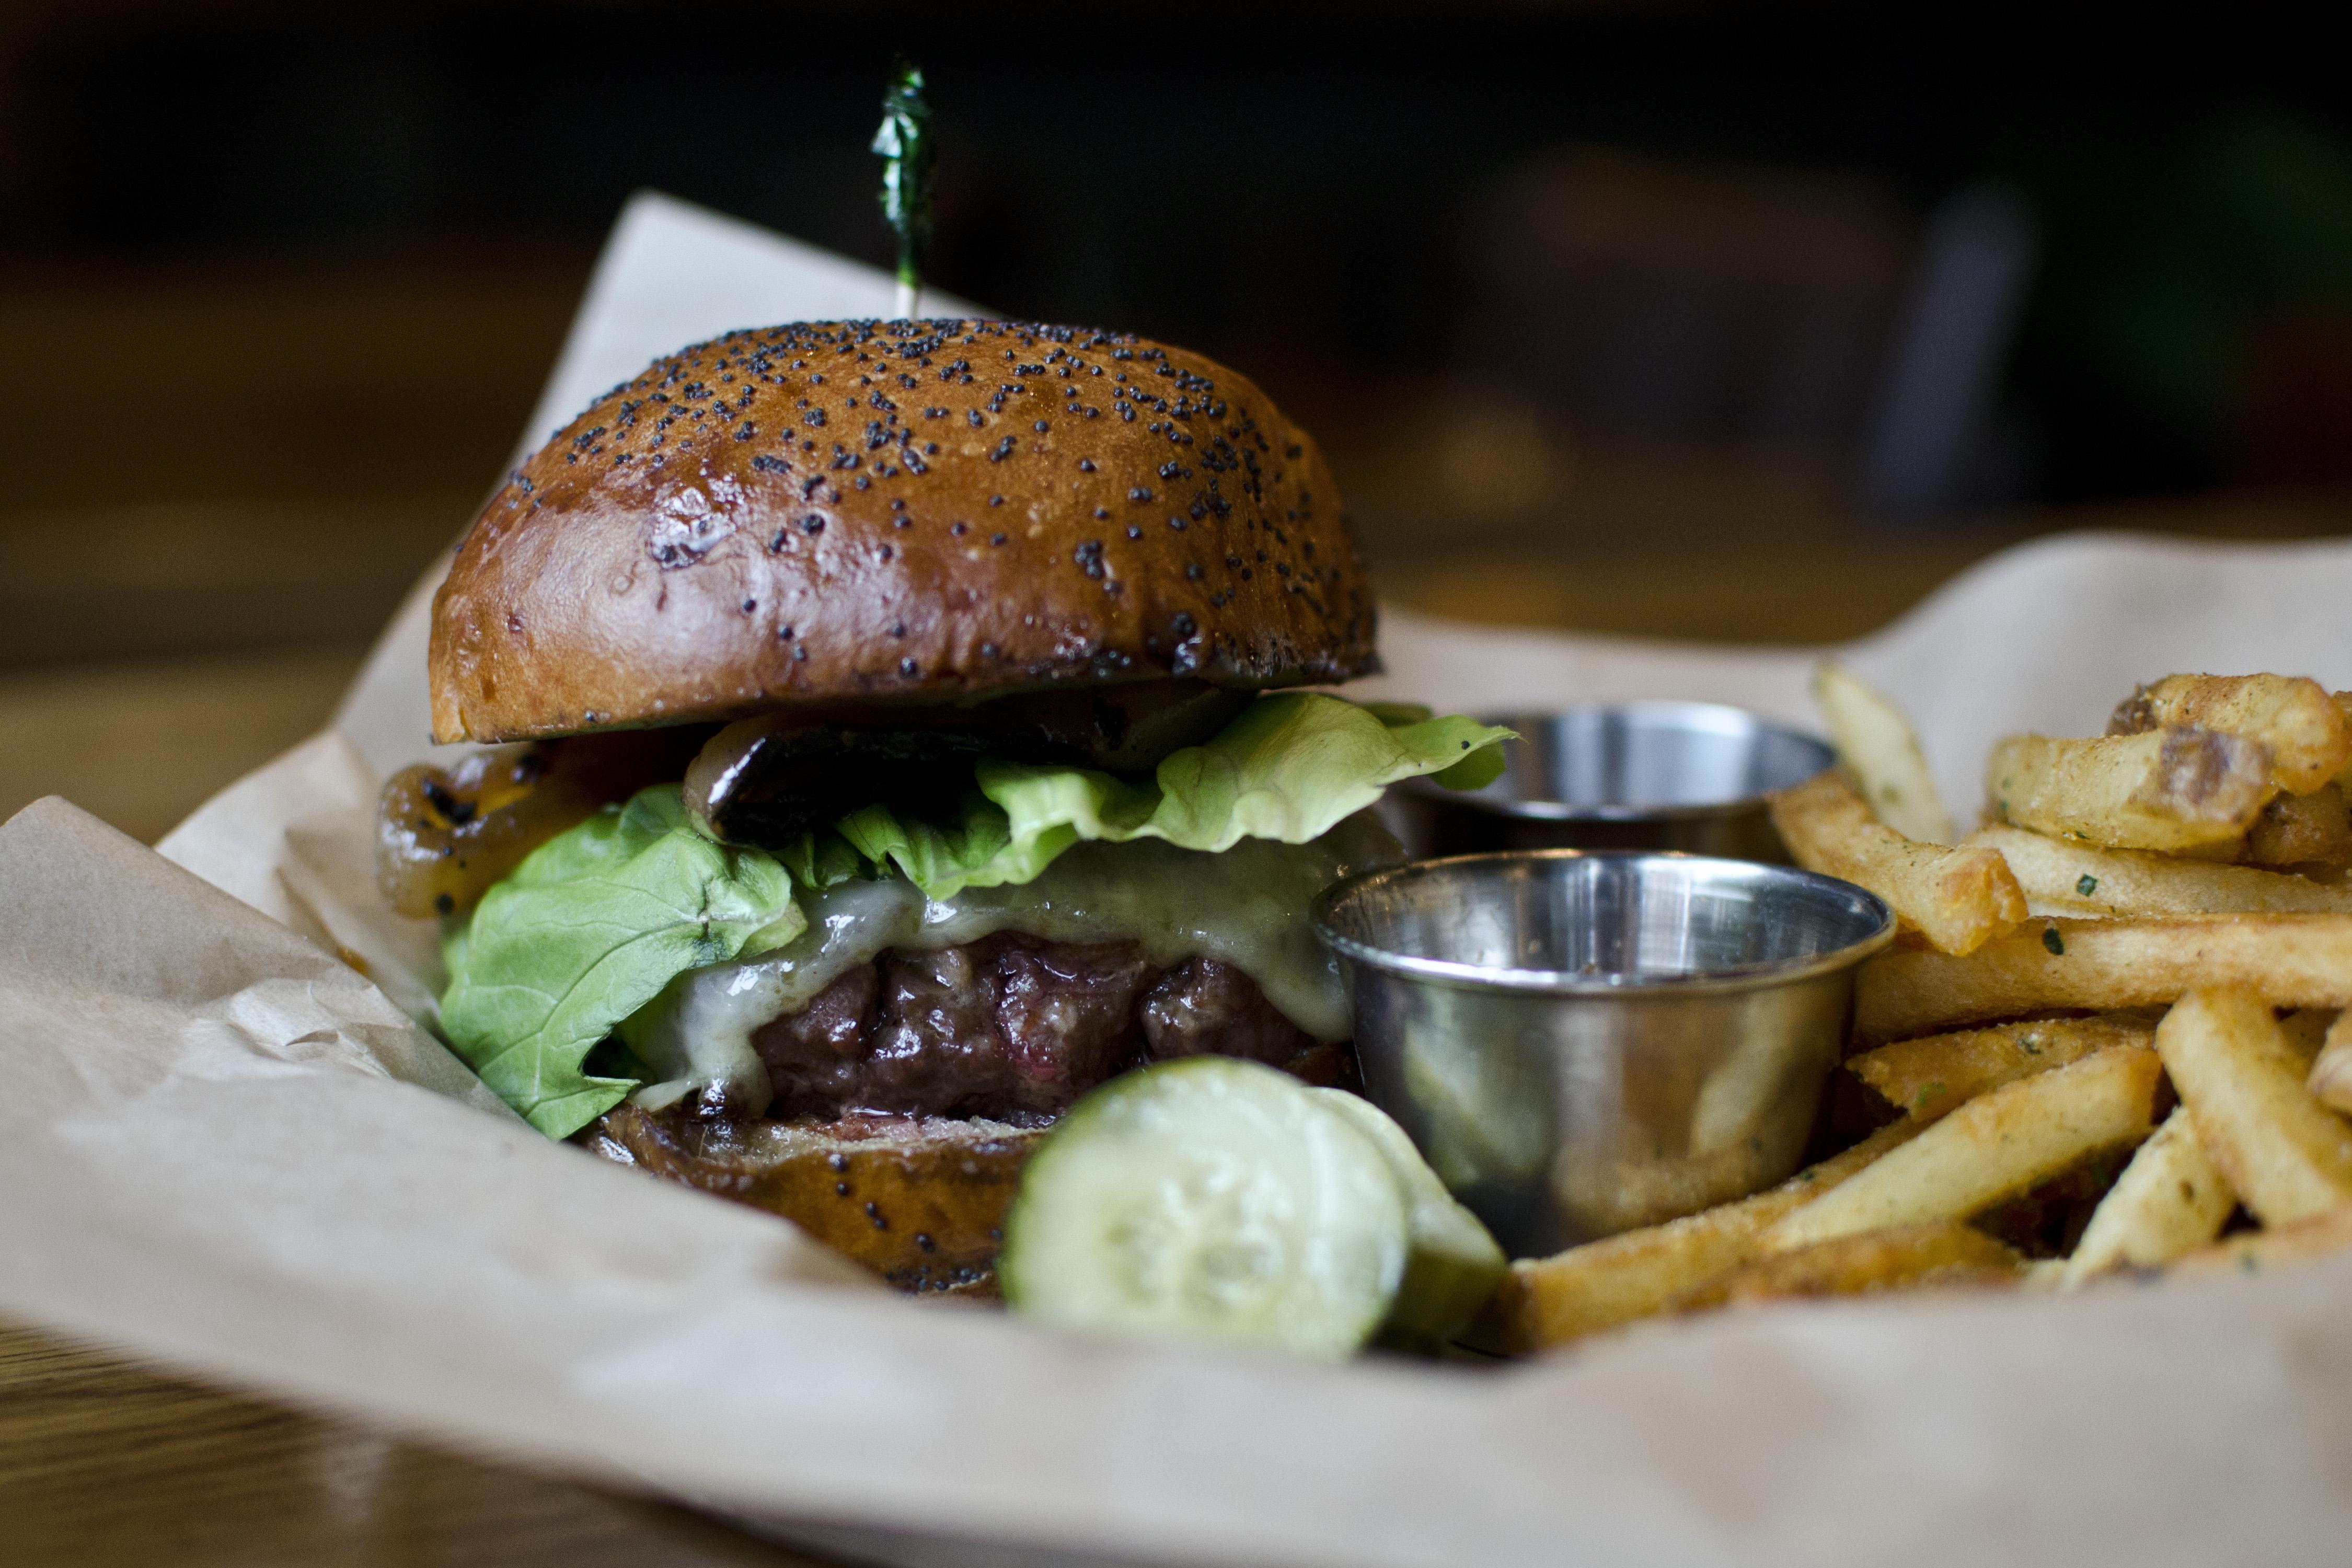 The Kirkland Tap & Trotter Burger